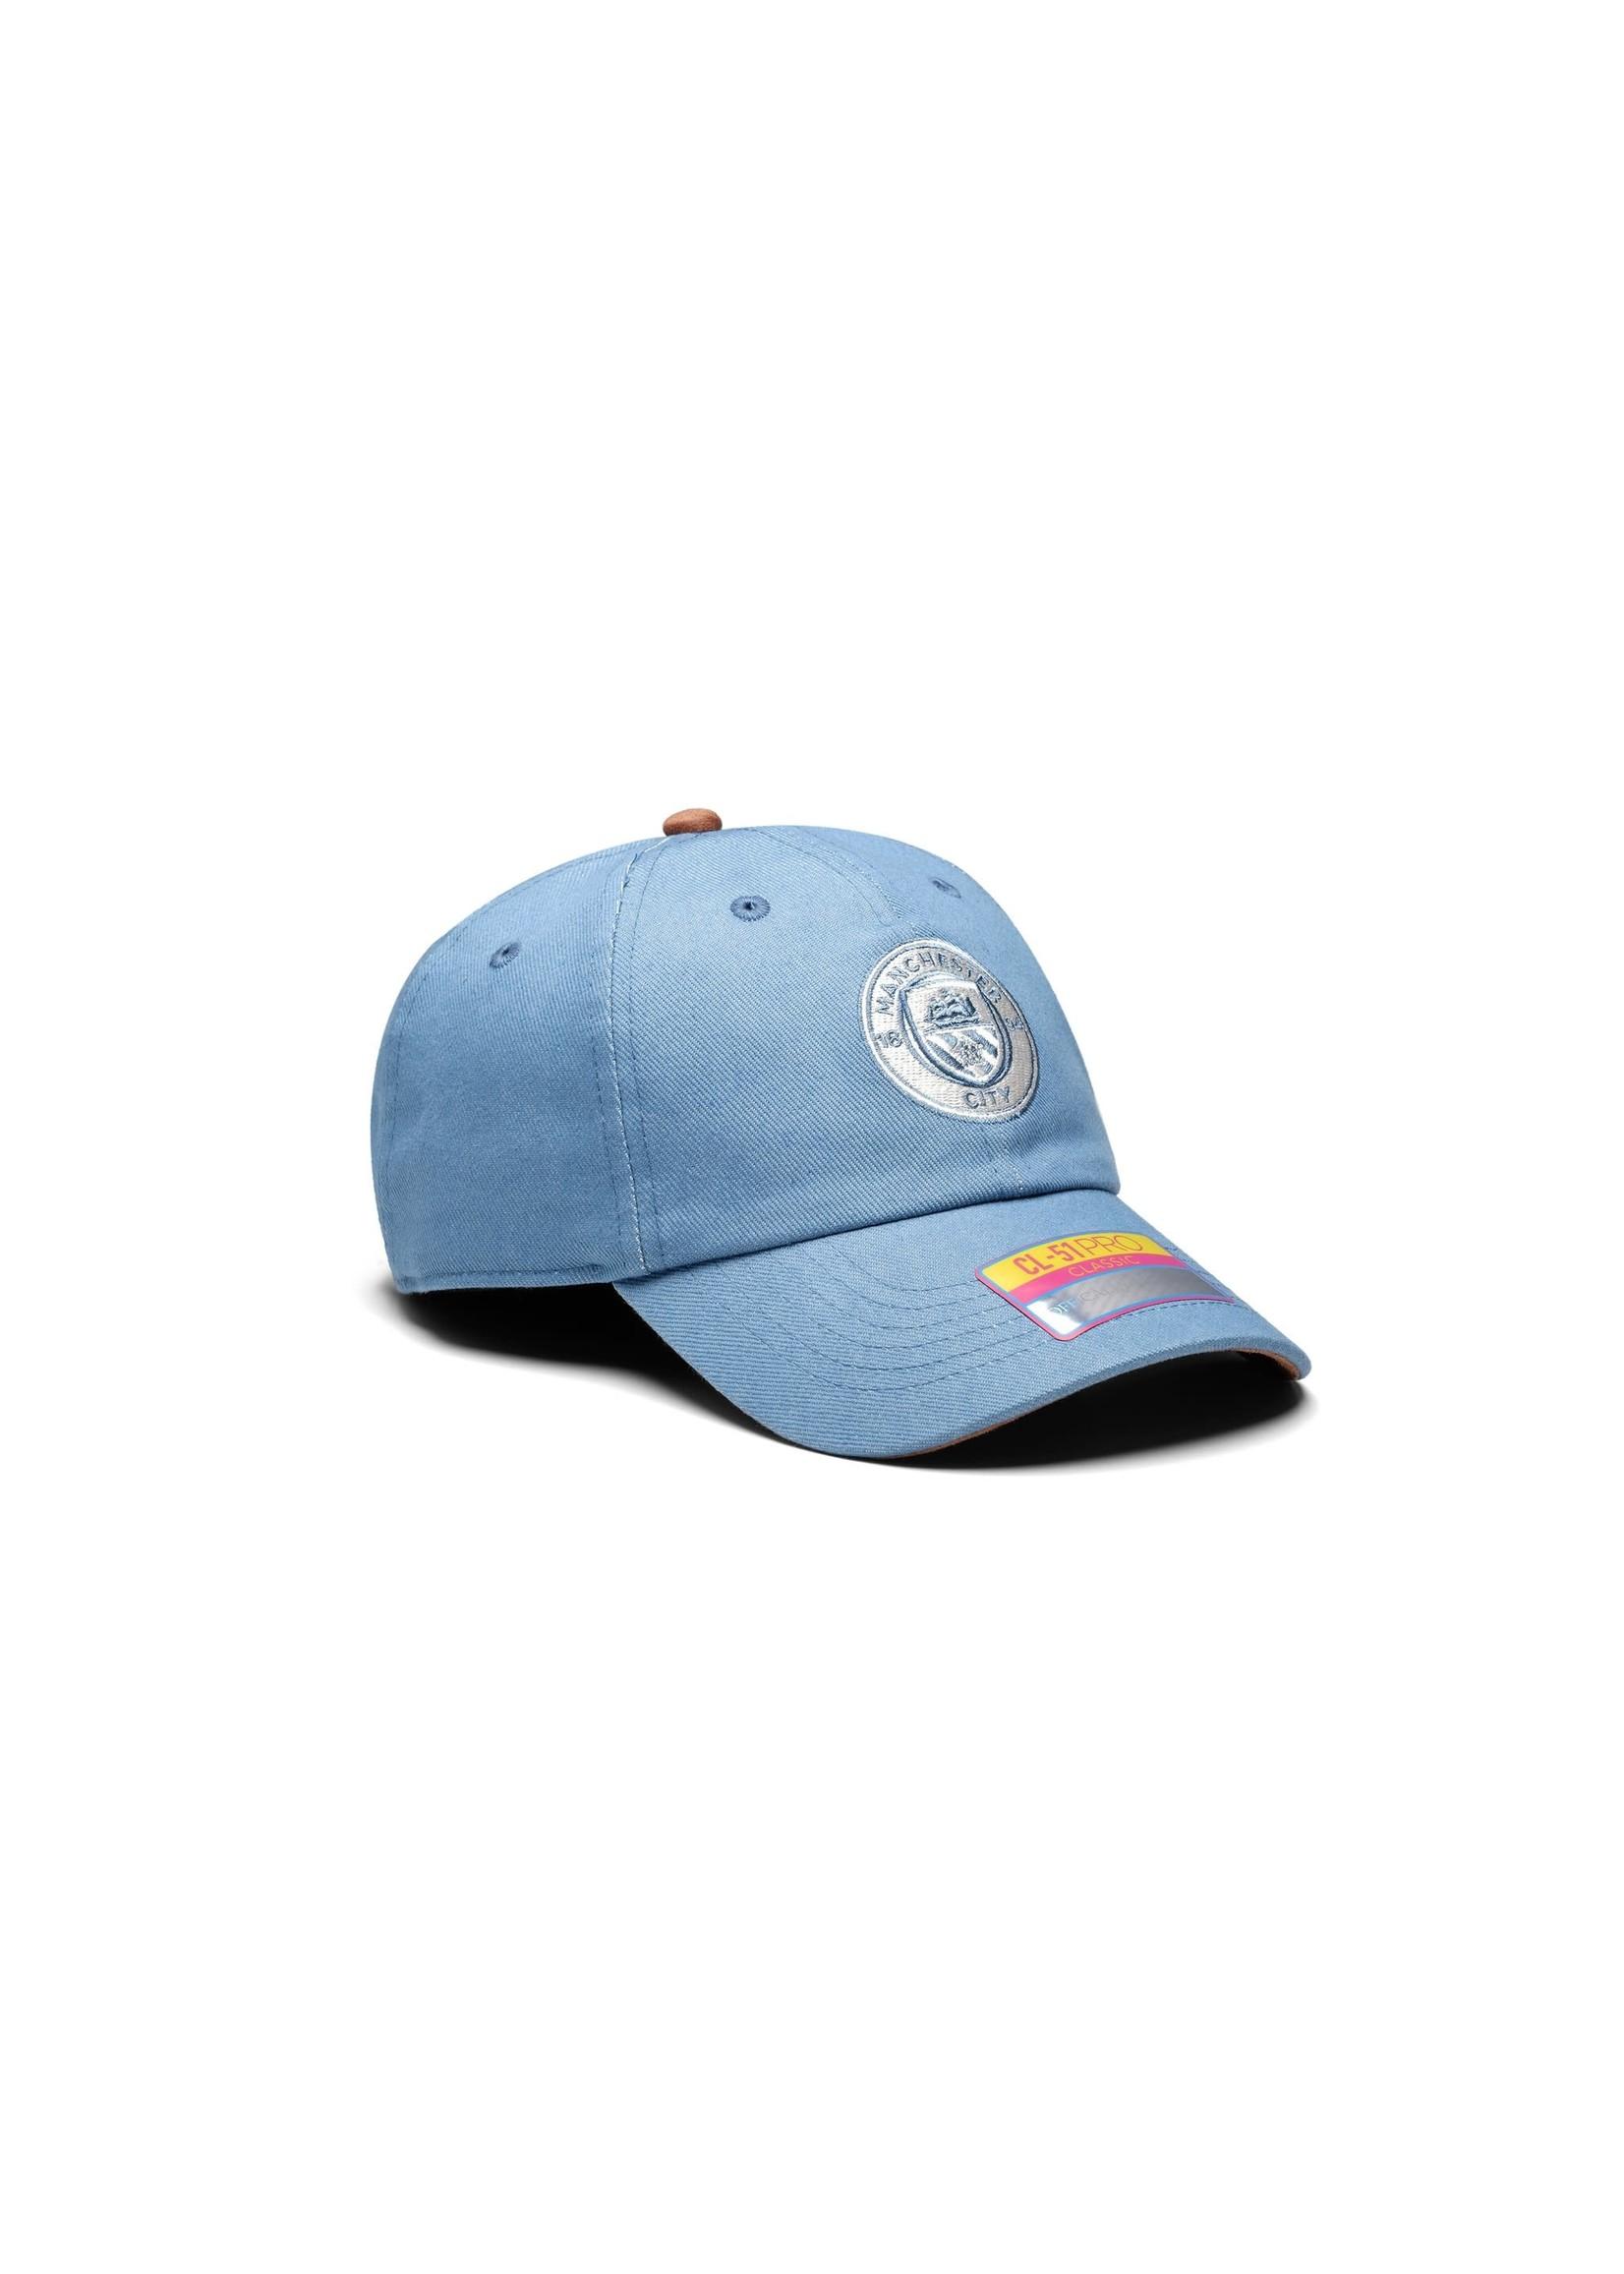 CLASSIC BAMBO BASEBALL HAT